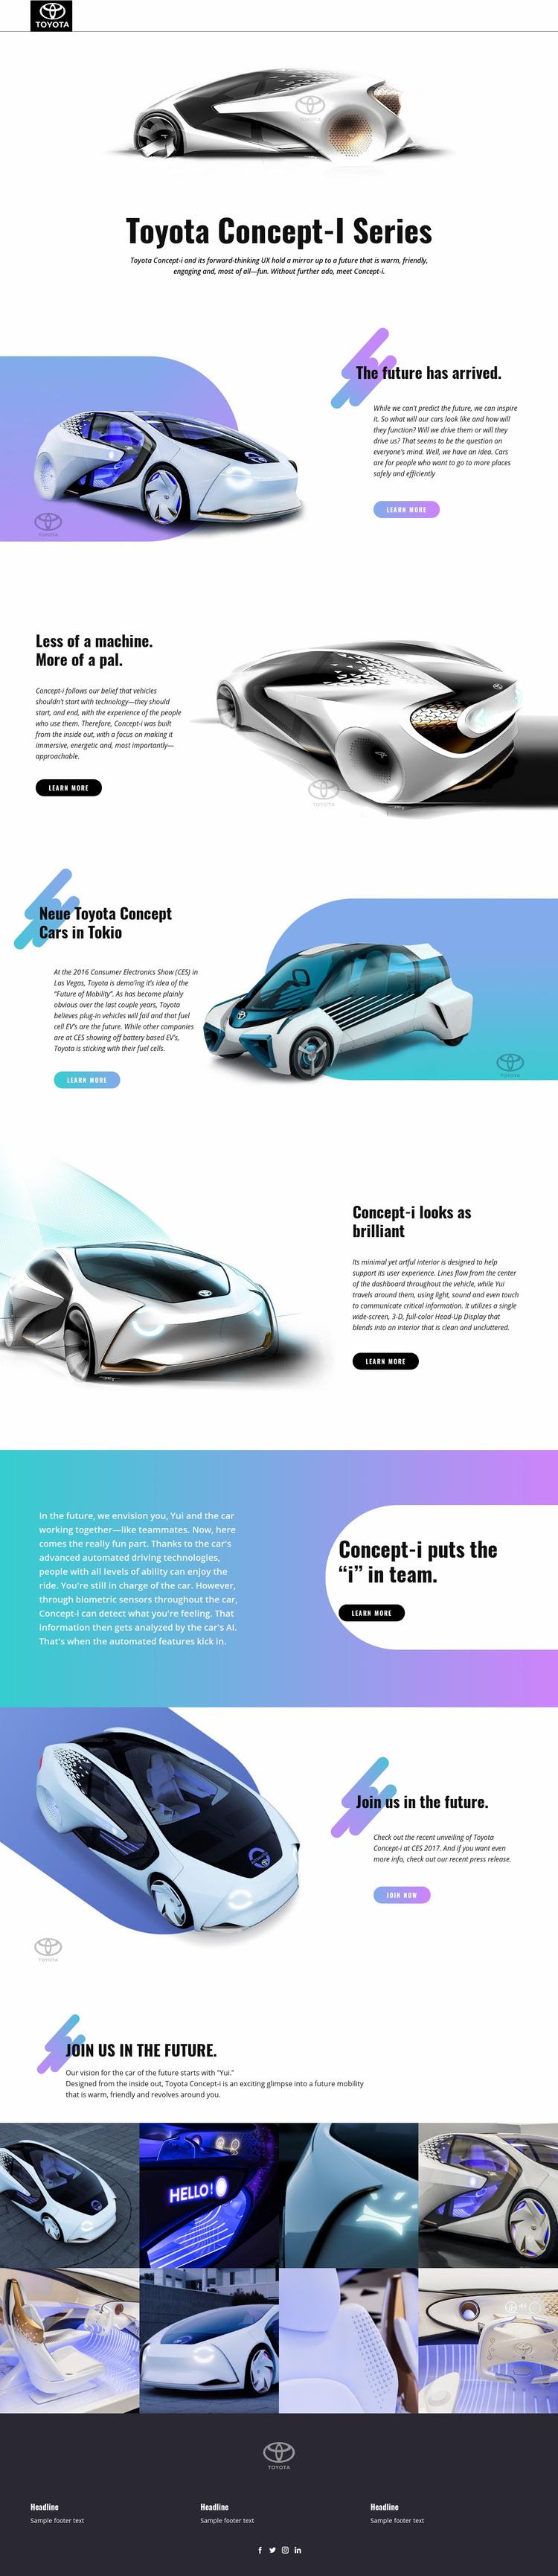 Advanced innovation cars Web Page Designer